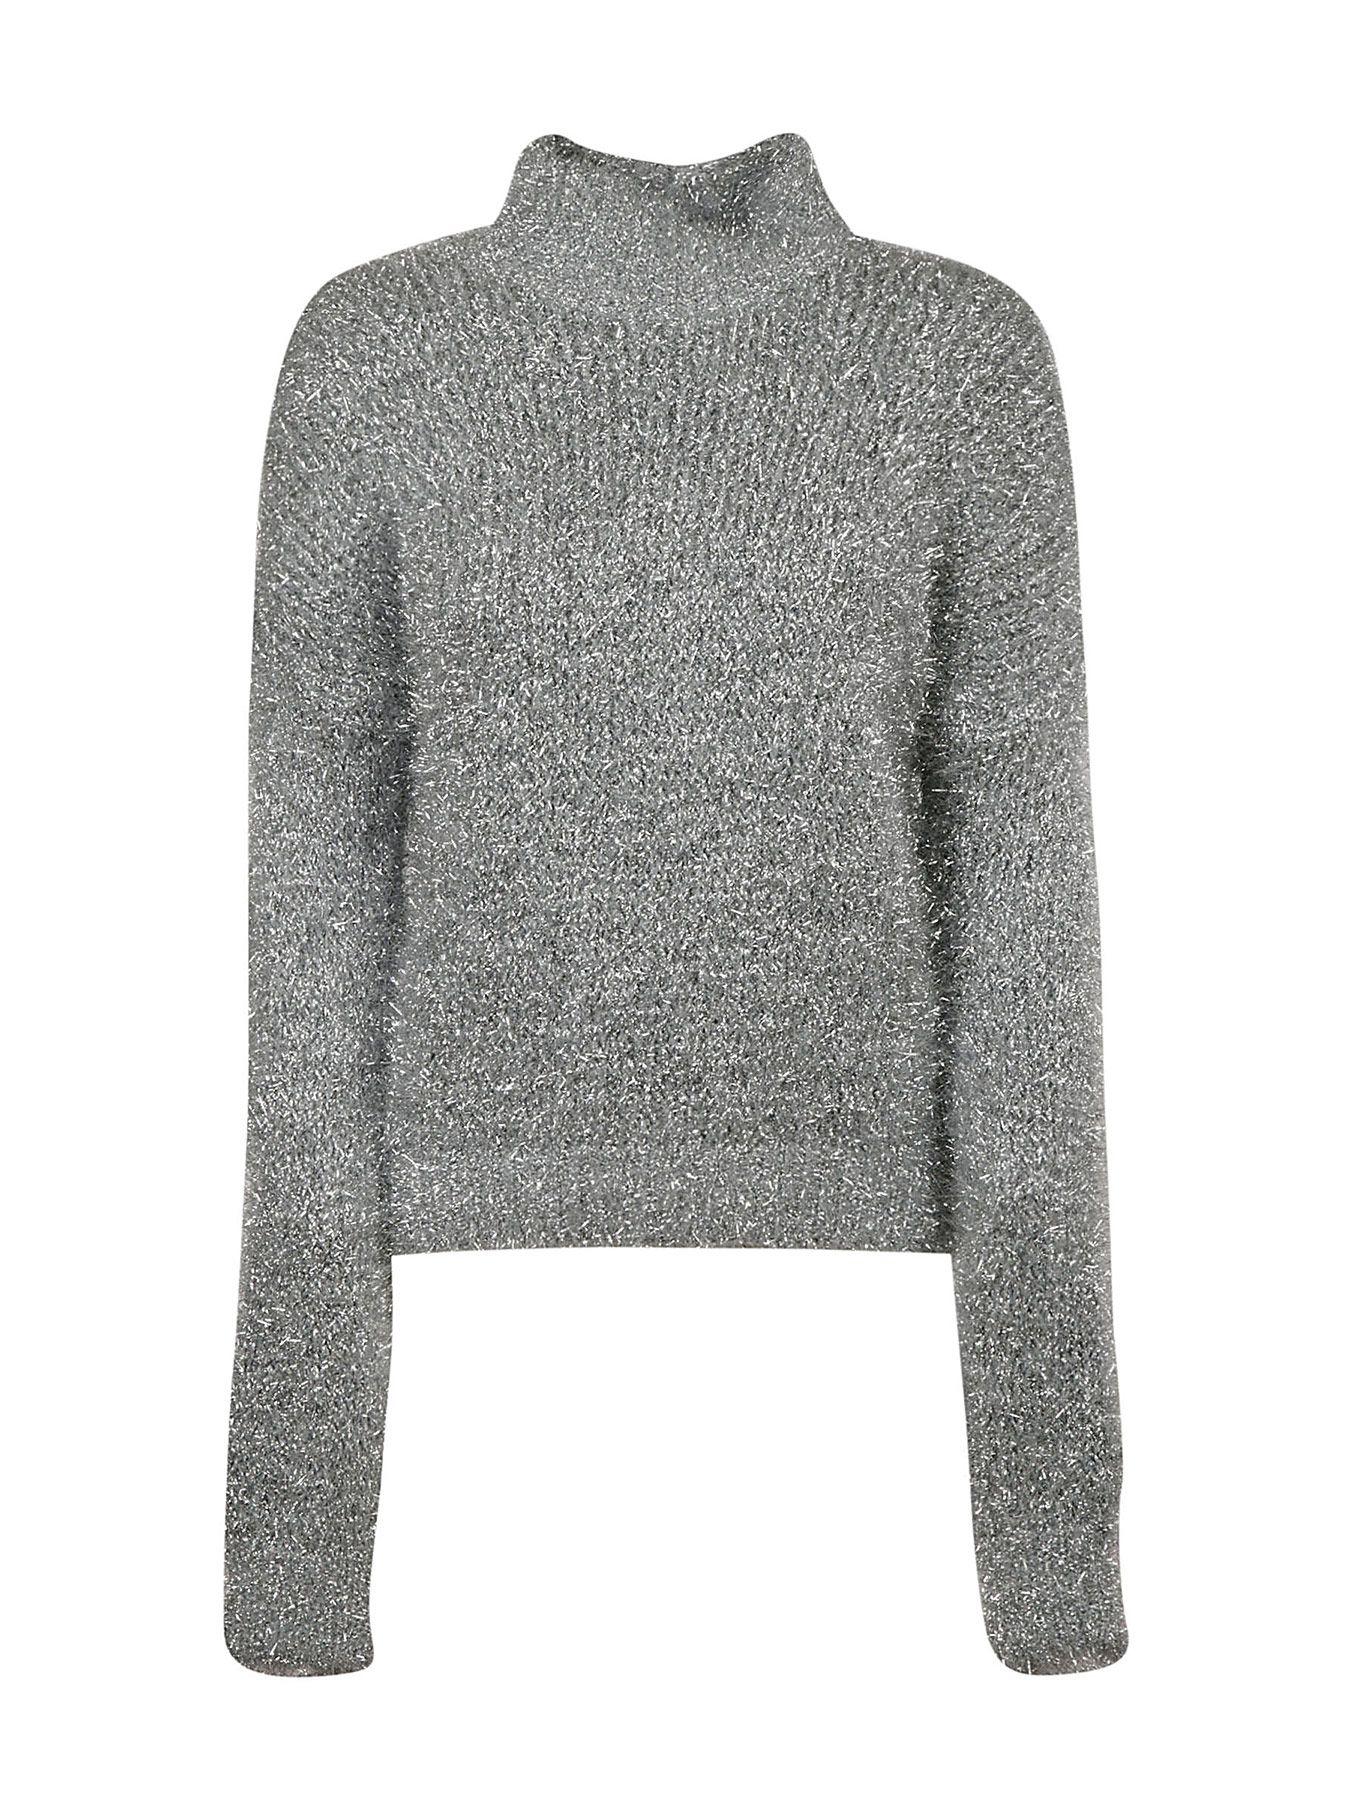 Classic Sweater